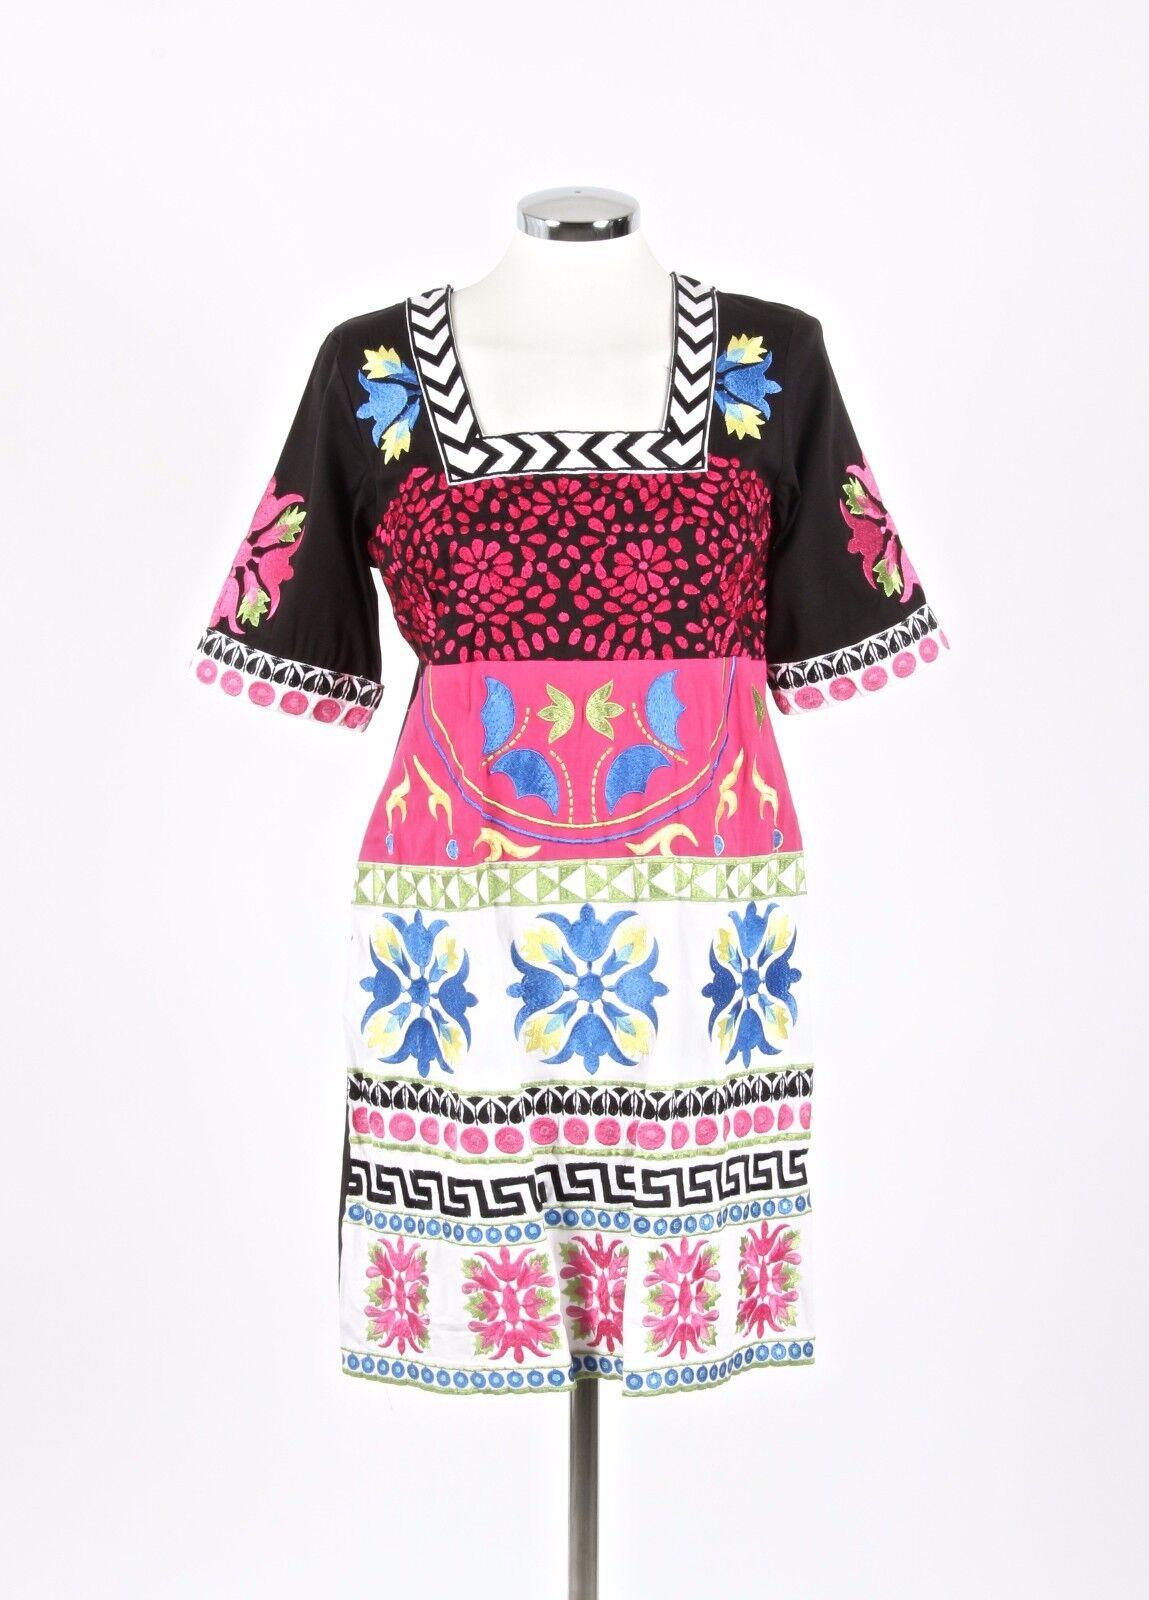 Kleid Frau - NIZA - art.41177 - col.schwarz Fantasie - Rabatt 70%